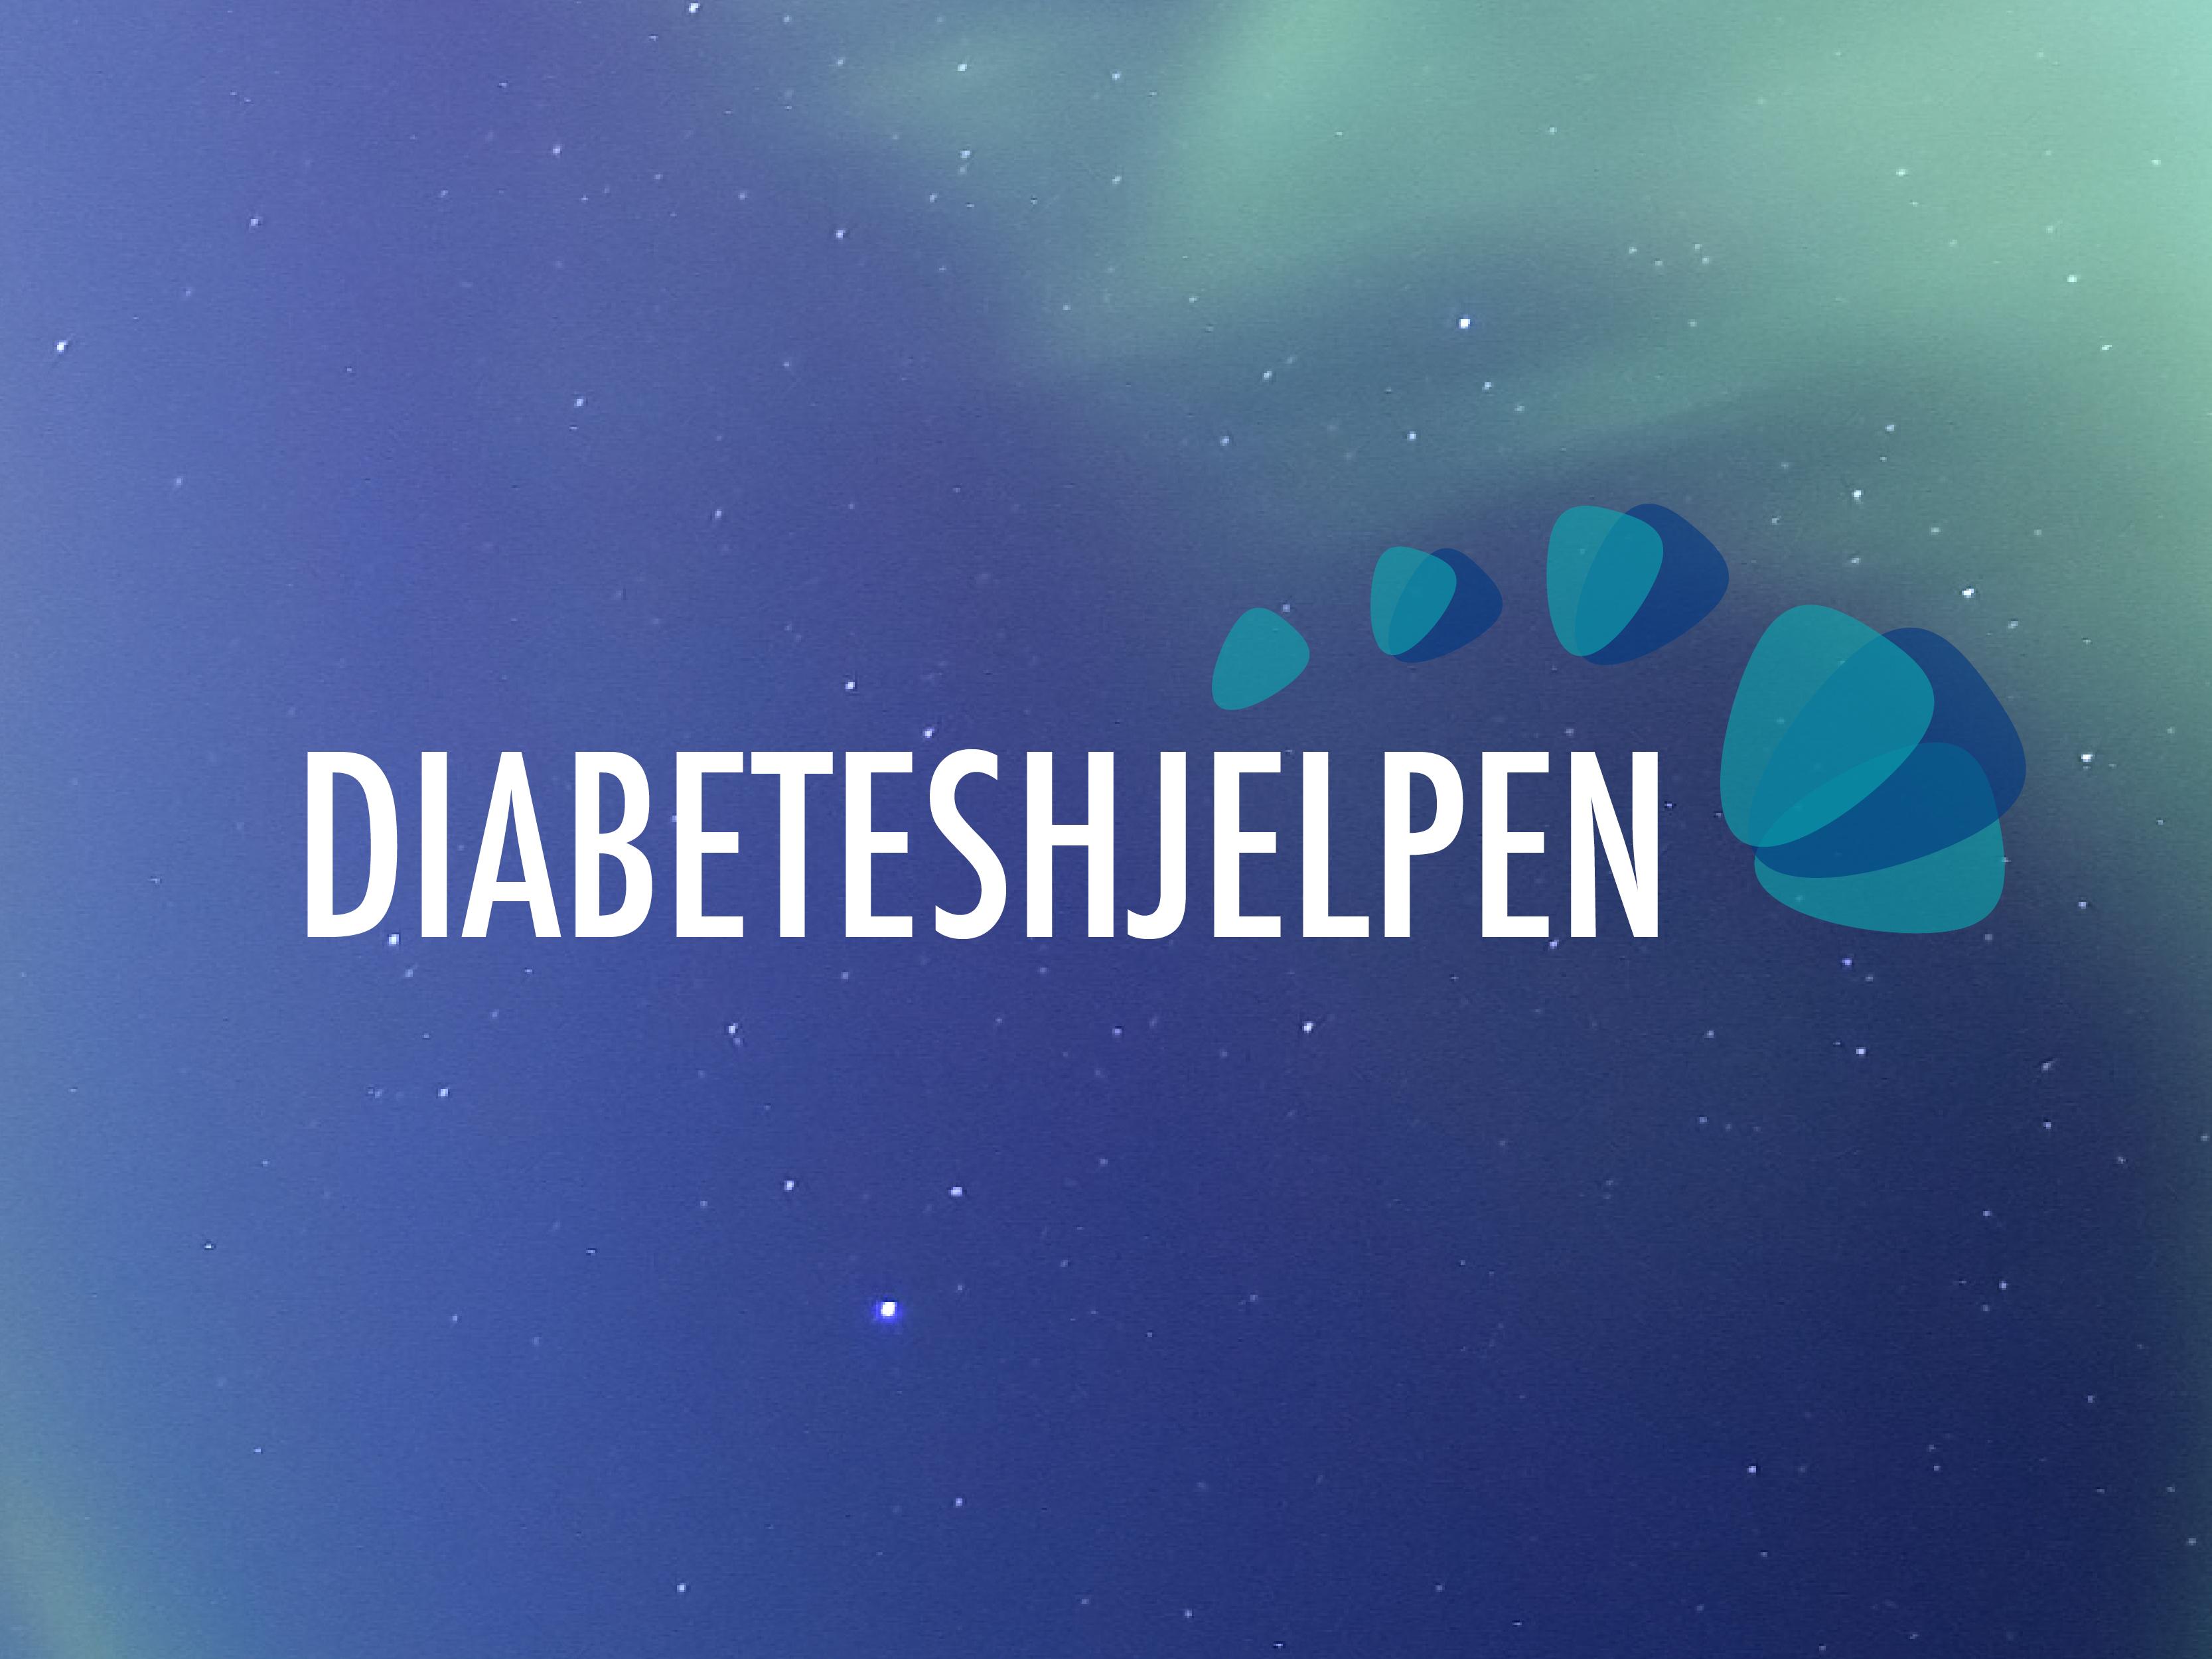 Diabeteshjelpen